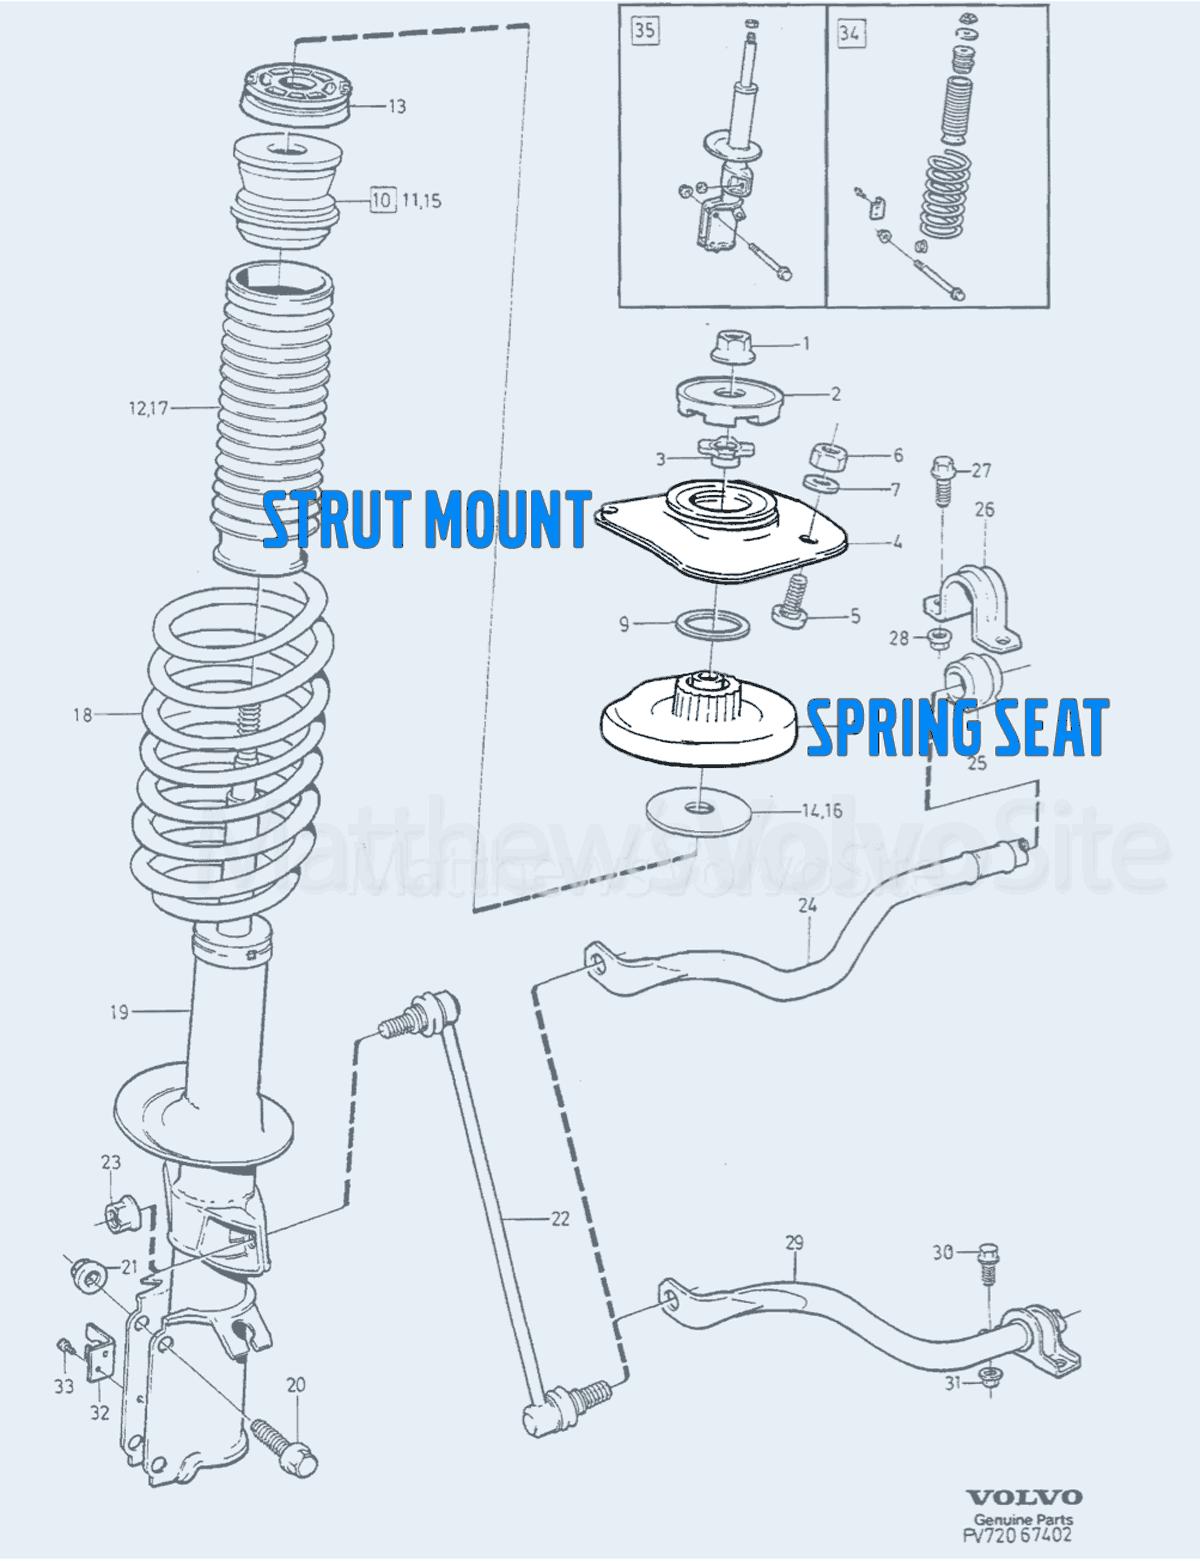 Strut mount vs spring seat, entire view including strut/spring, tie rod, hardware